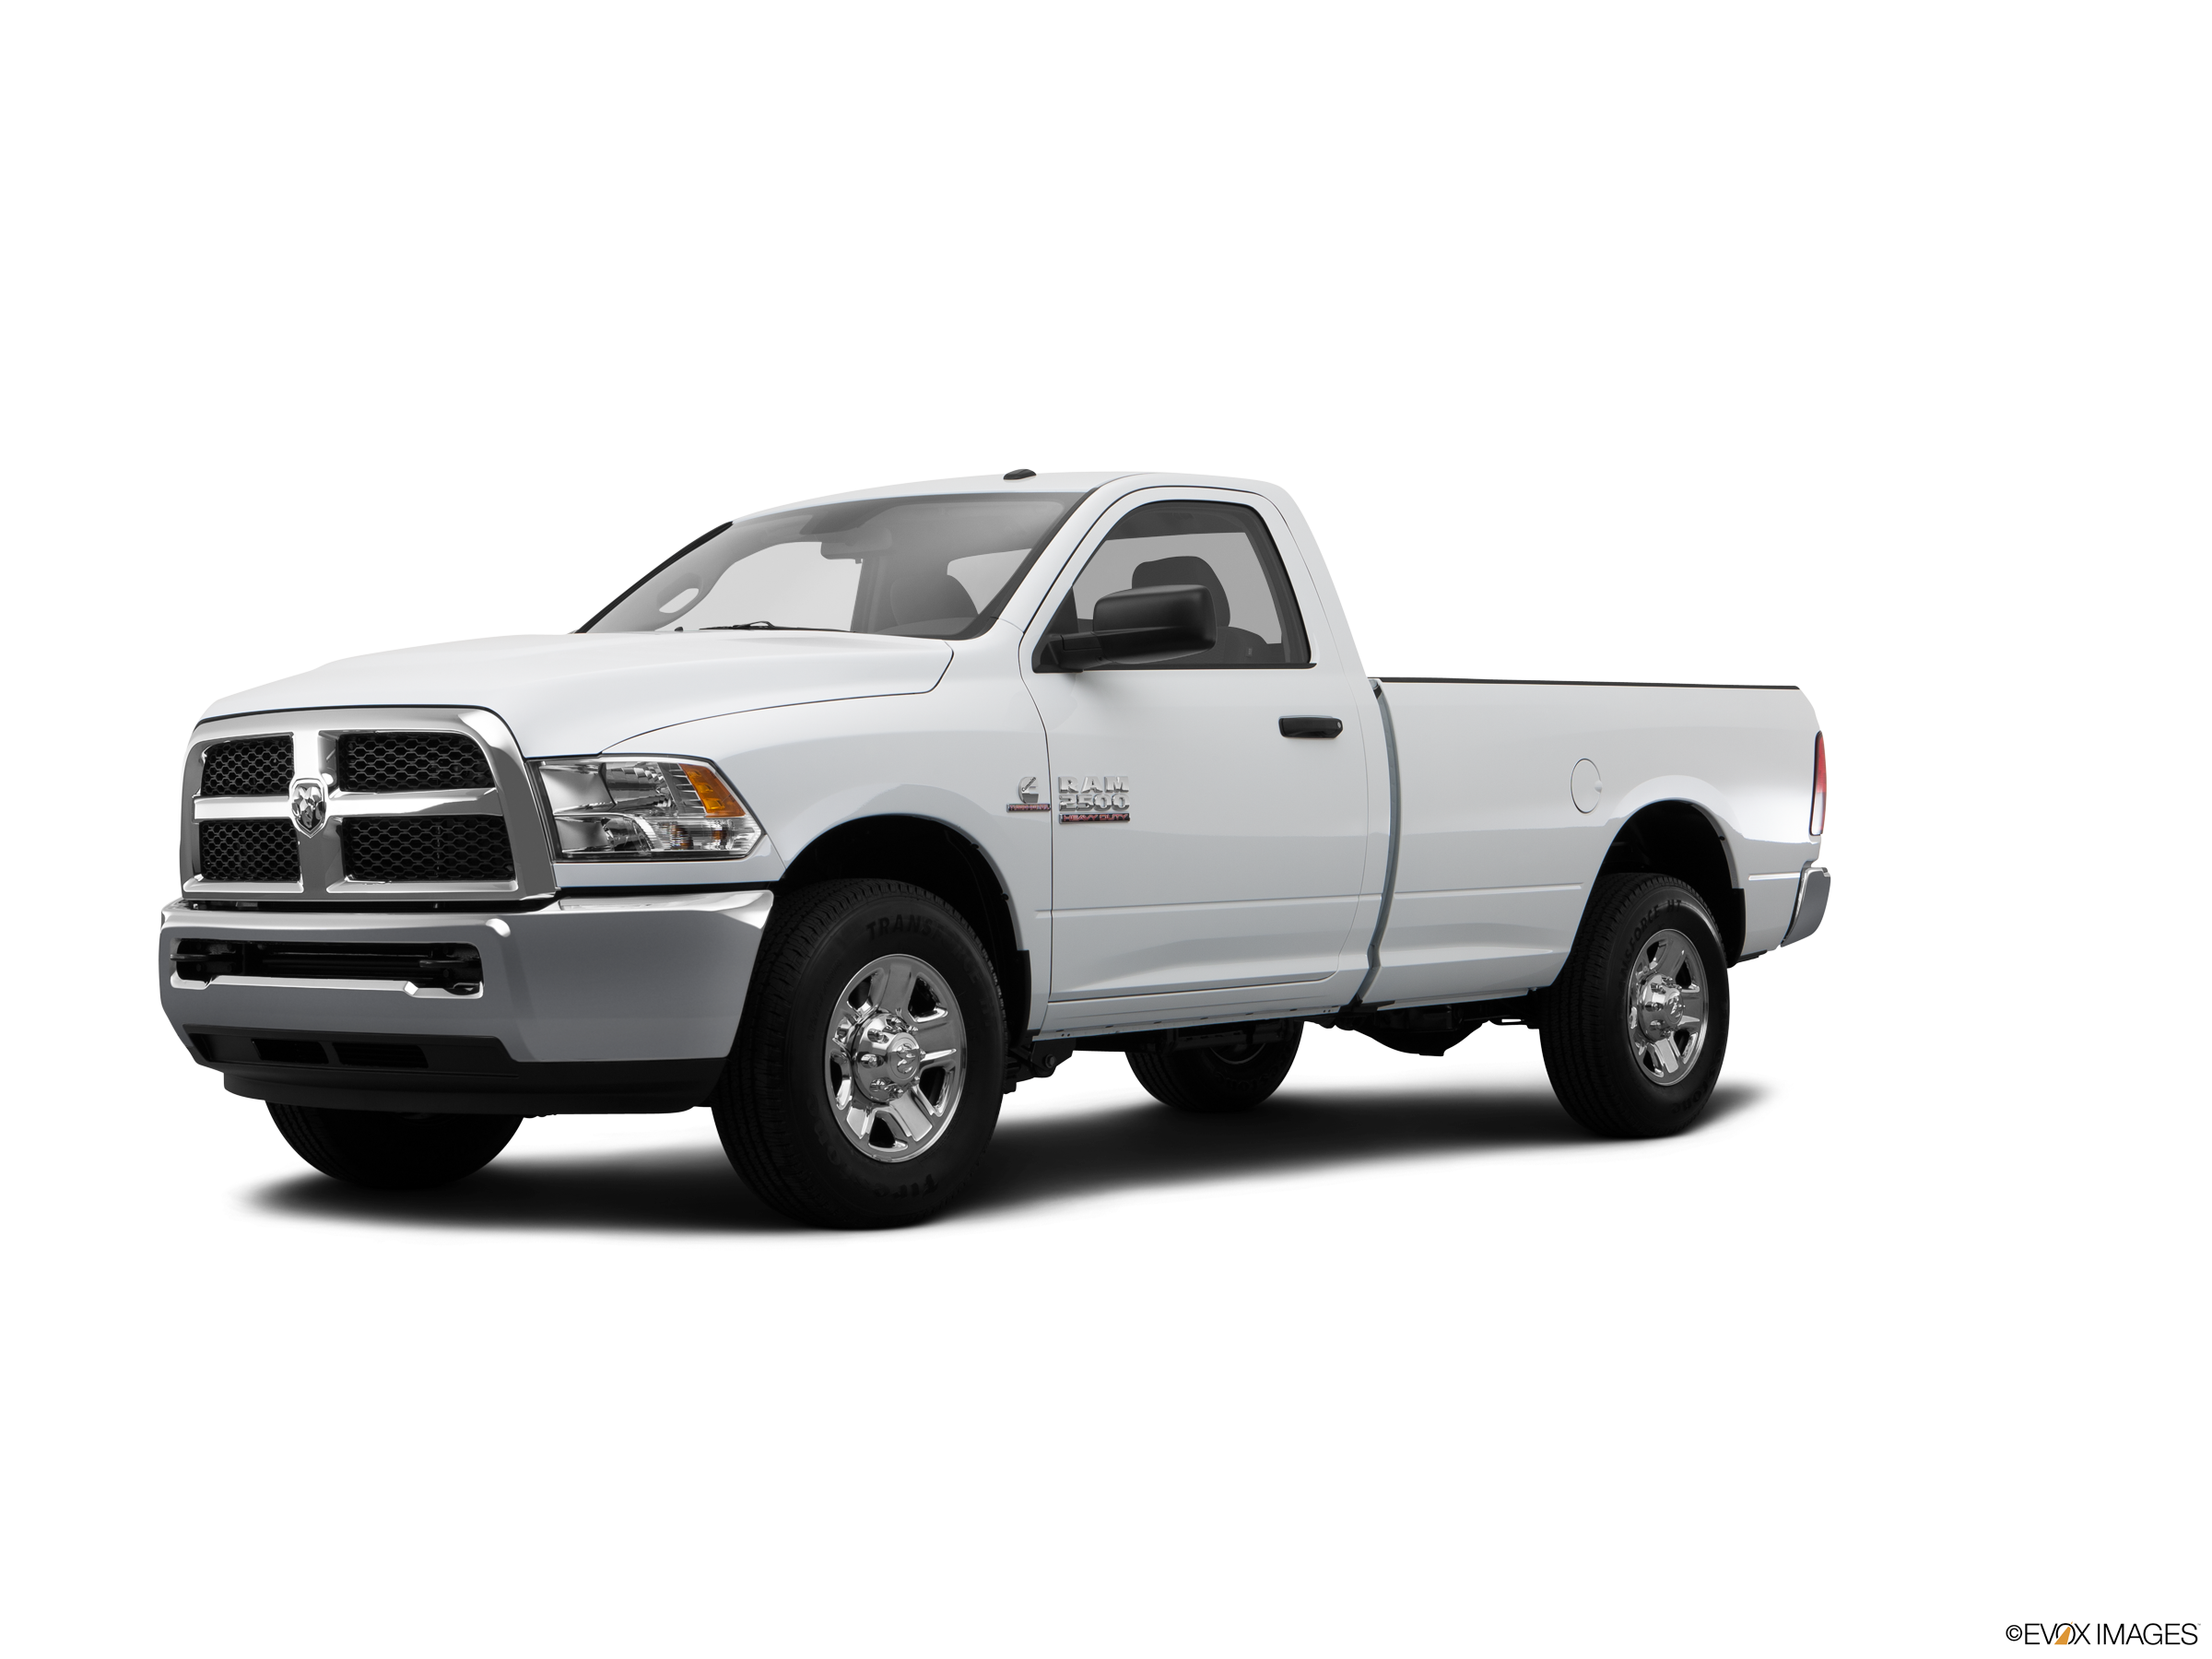 2015 Ram 2500 Trucks Values Cars For Sale Kelley Blue Book